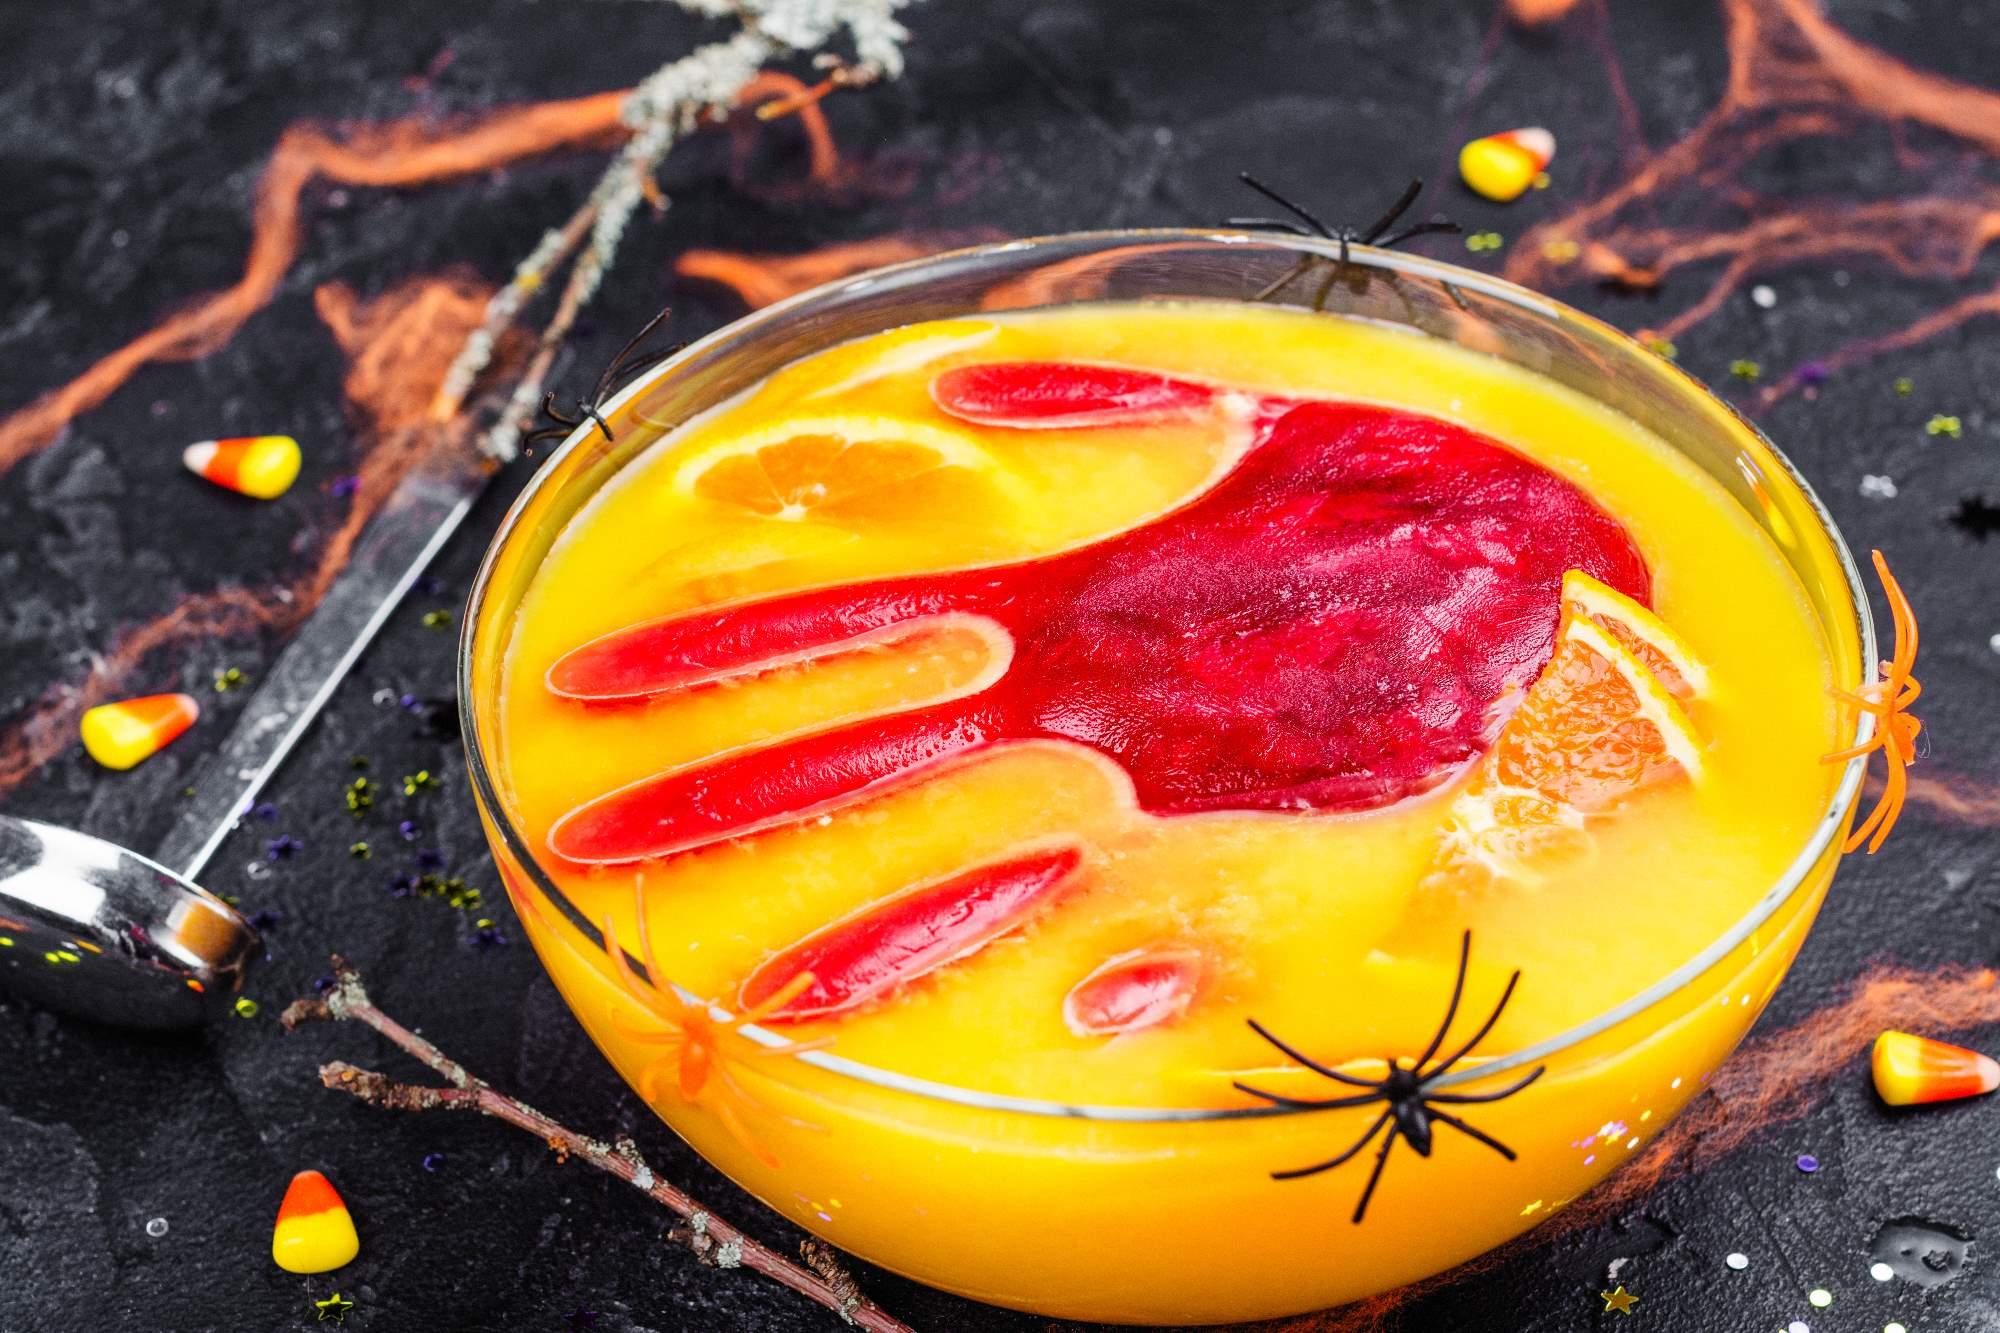 Halloweenpunch med en blodig hånd